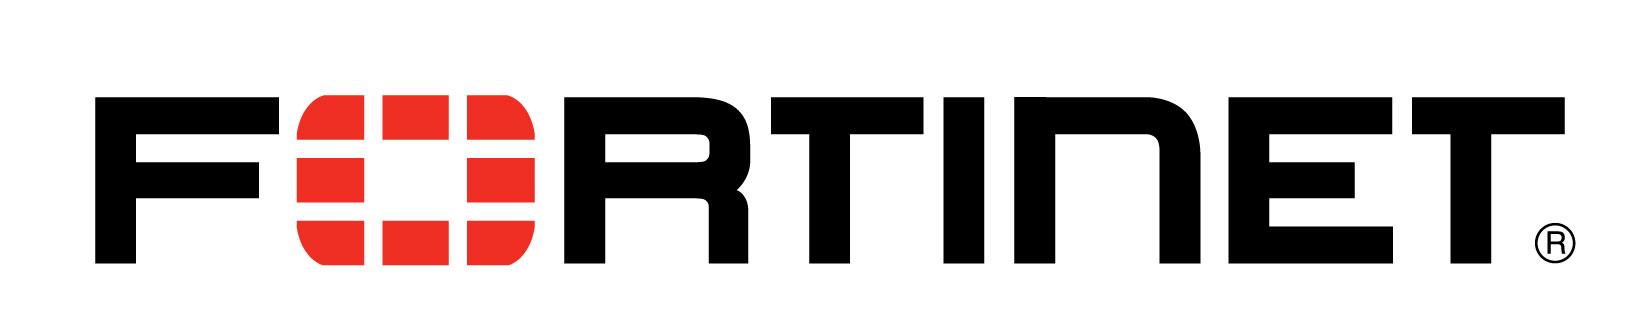 Fortinet 59e098b19ce96981cc7f8f0a